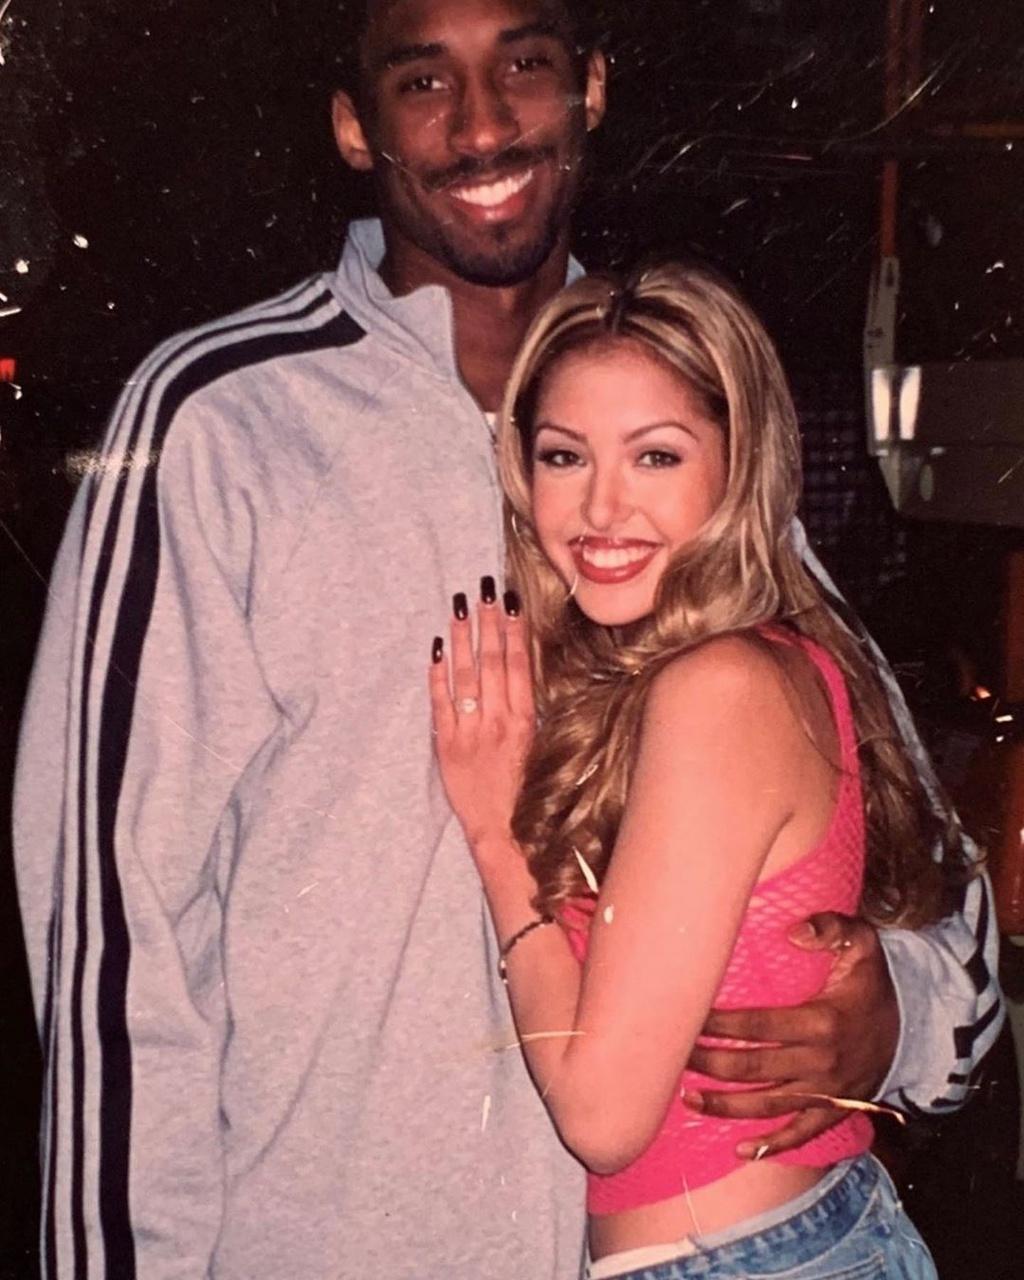 Chuyen tinh 20 nam cua sieu sao Kobe Bryant va nguoi mau vo danh hinh anh 2